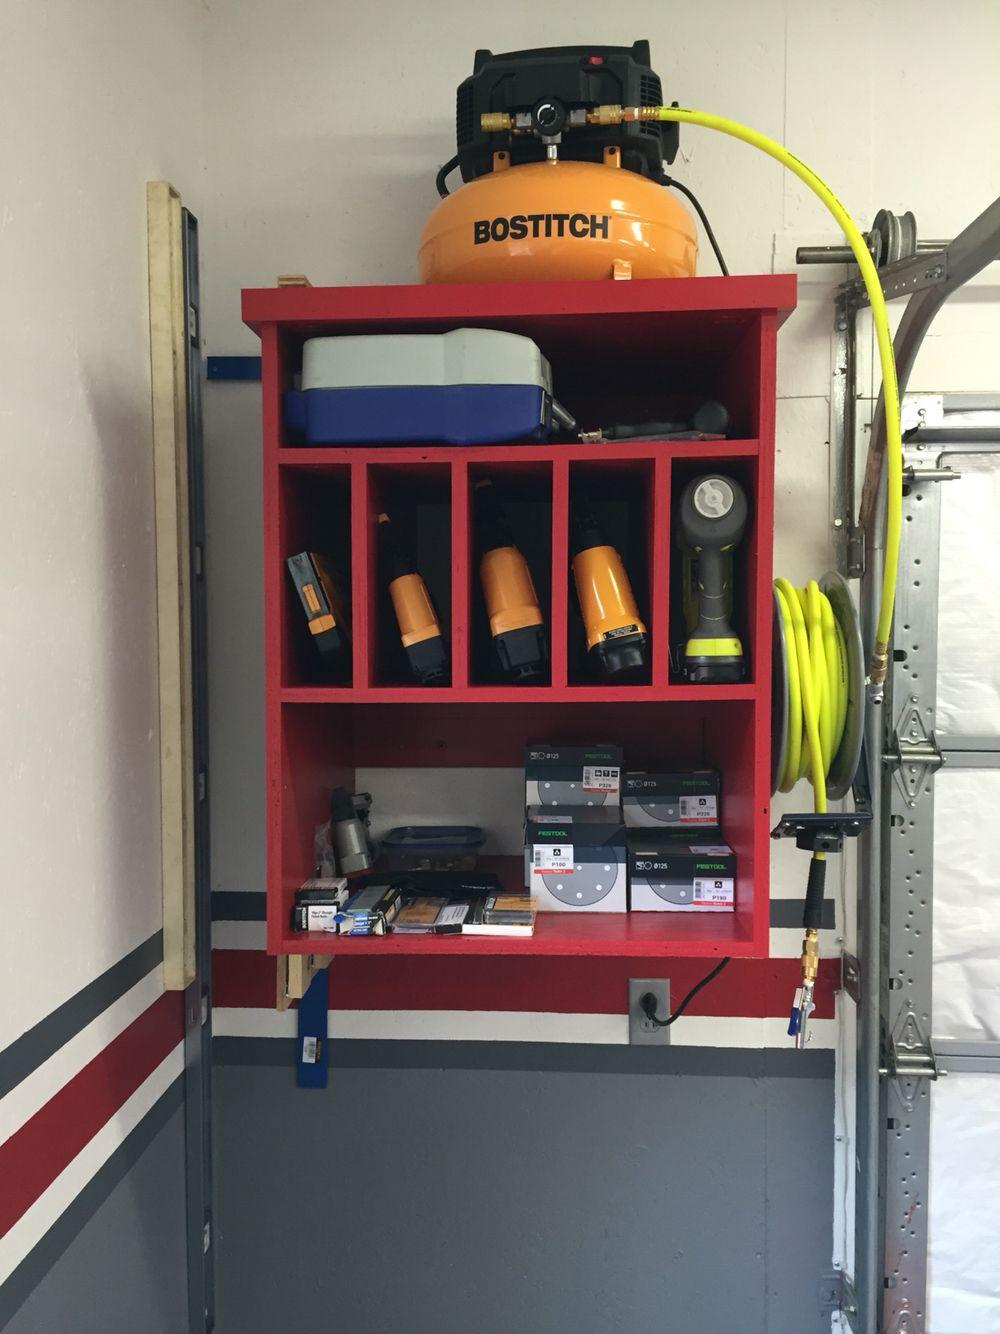 Air compressor cabinet and air tool storage | My Garage Workshop ...